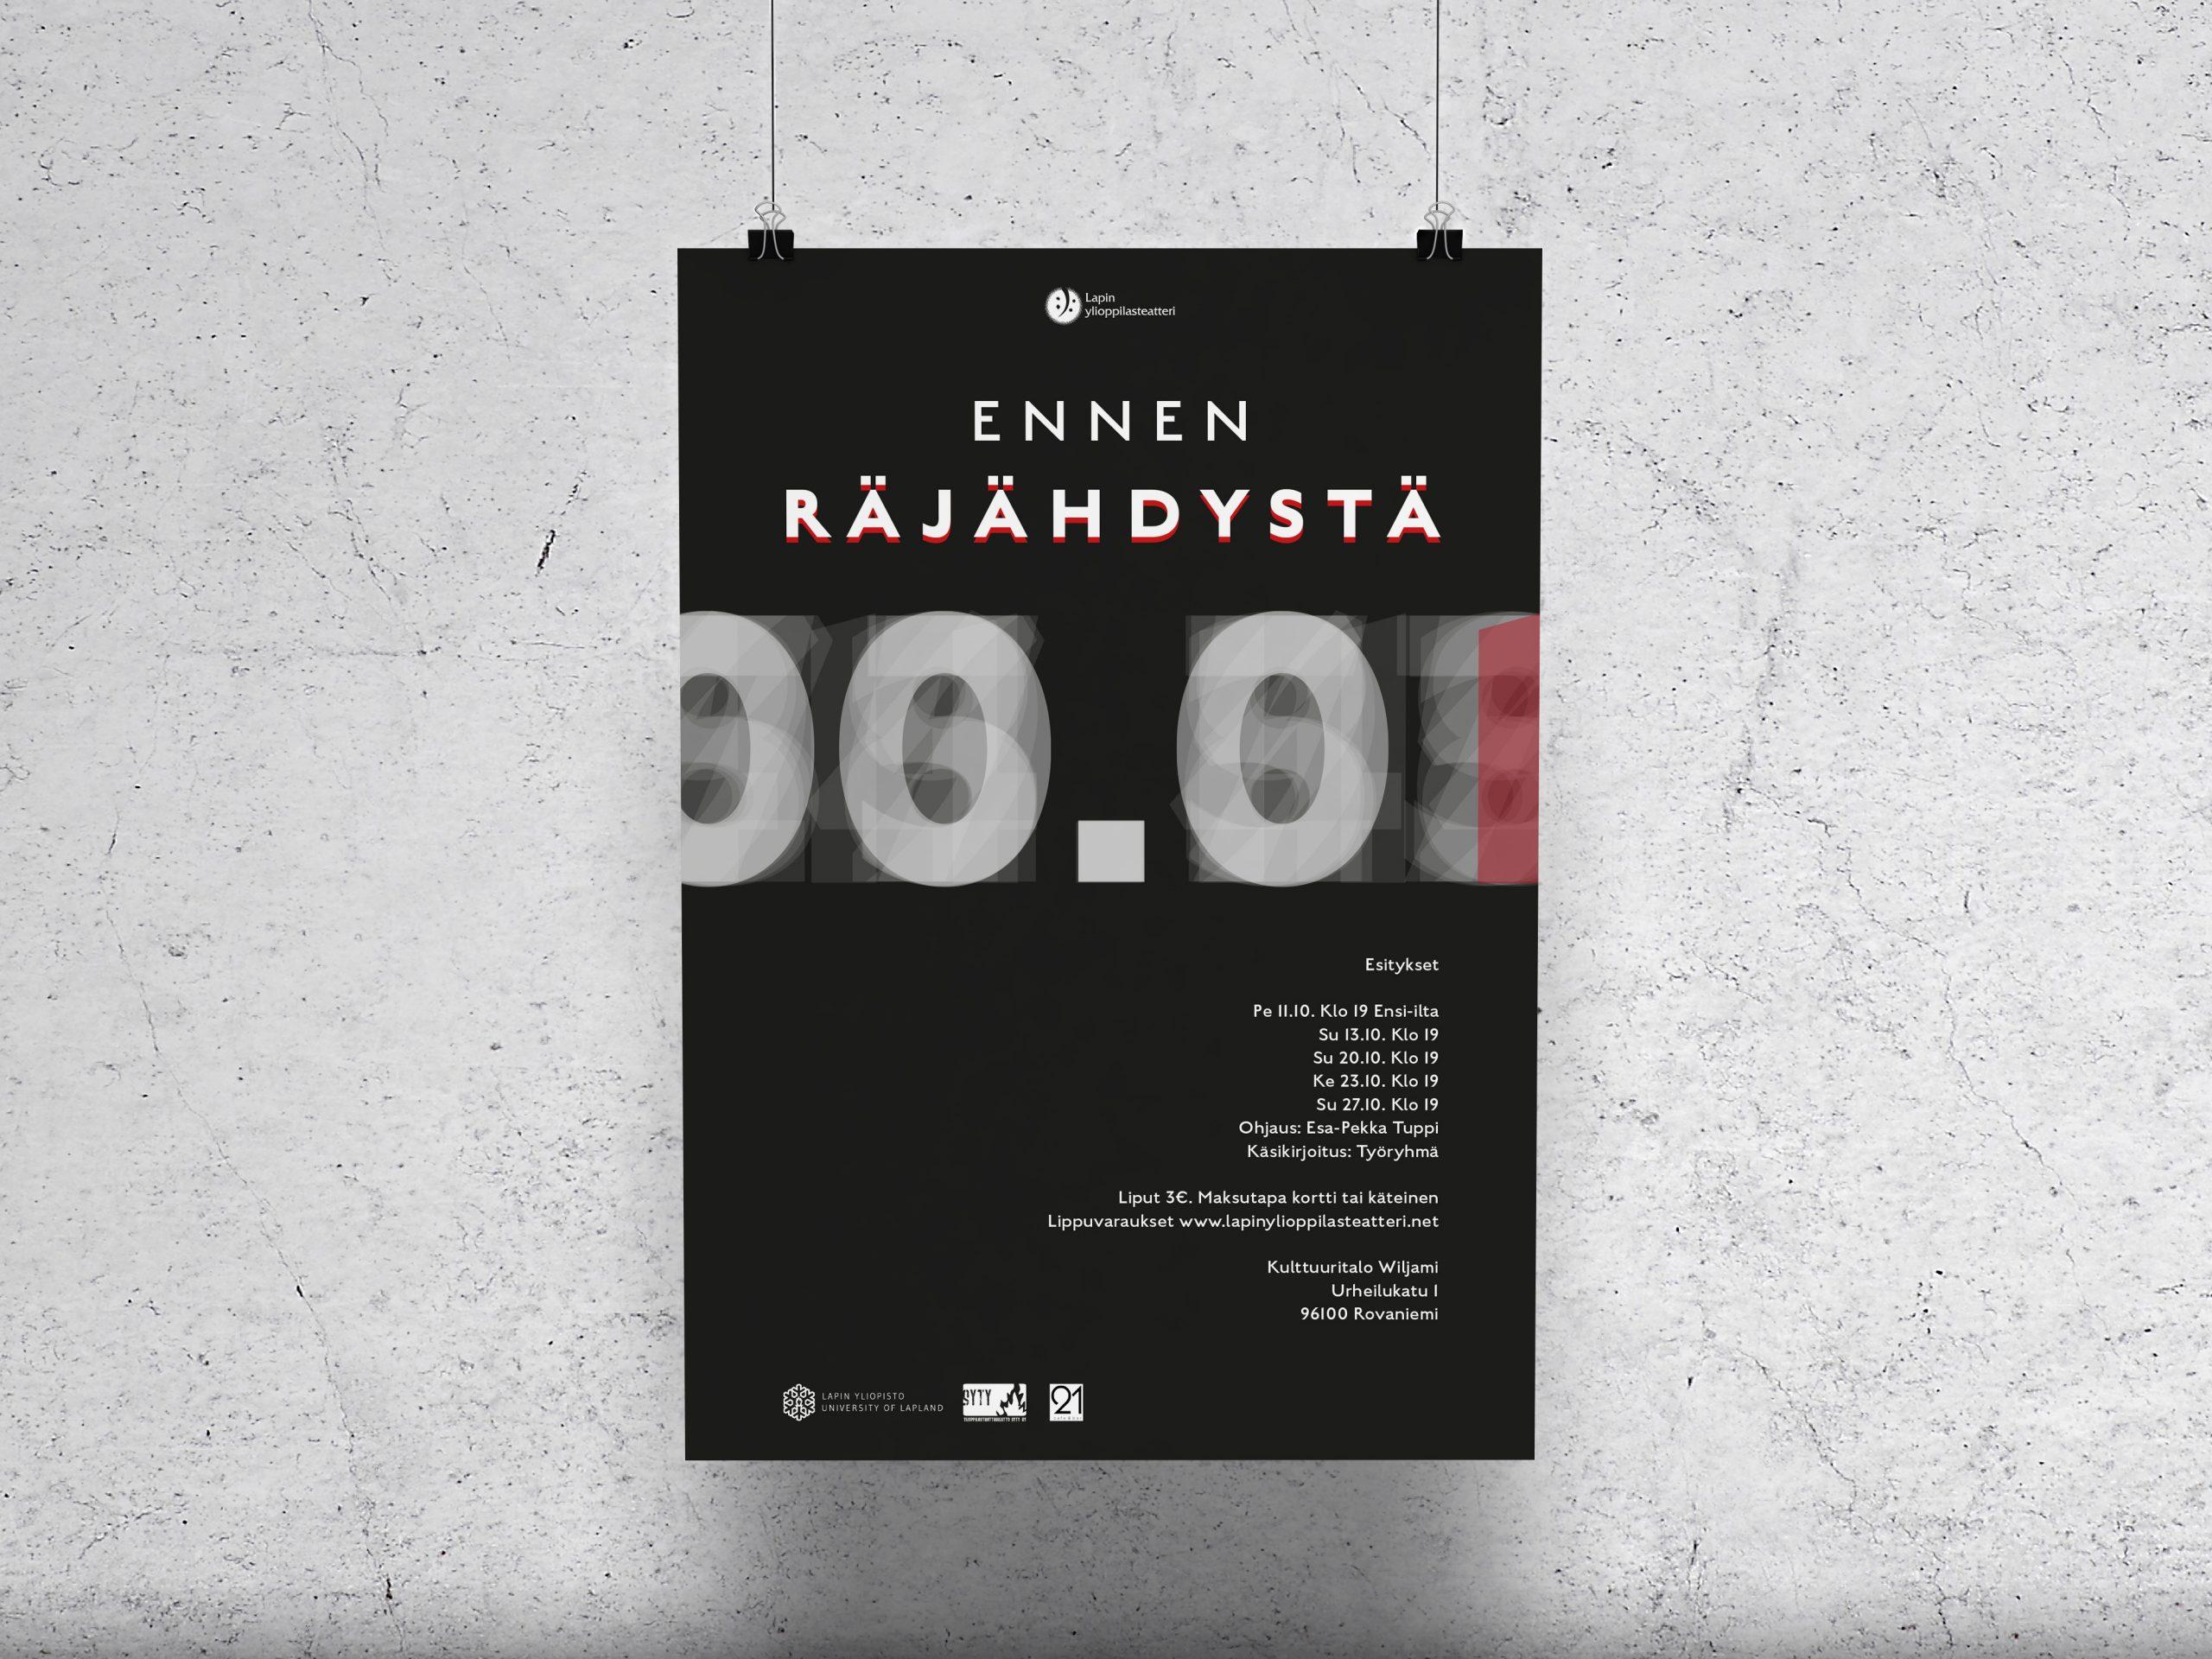 PALEDESIGN_ennen_rajahdysta_poster2